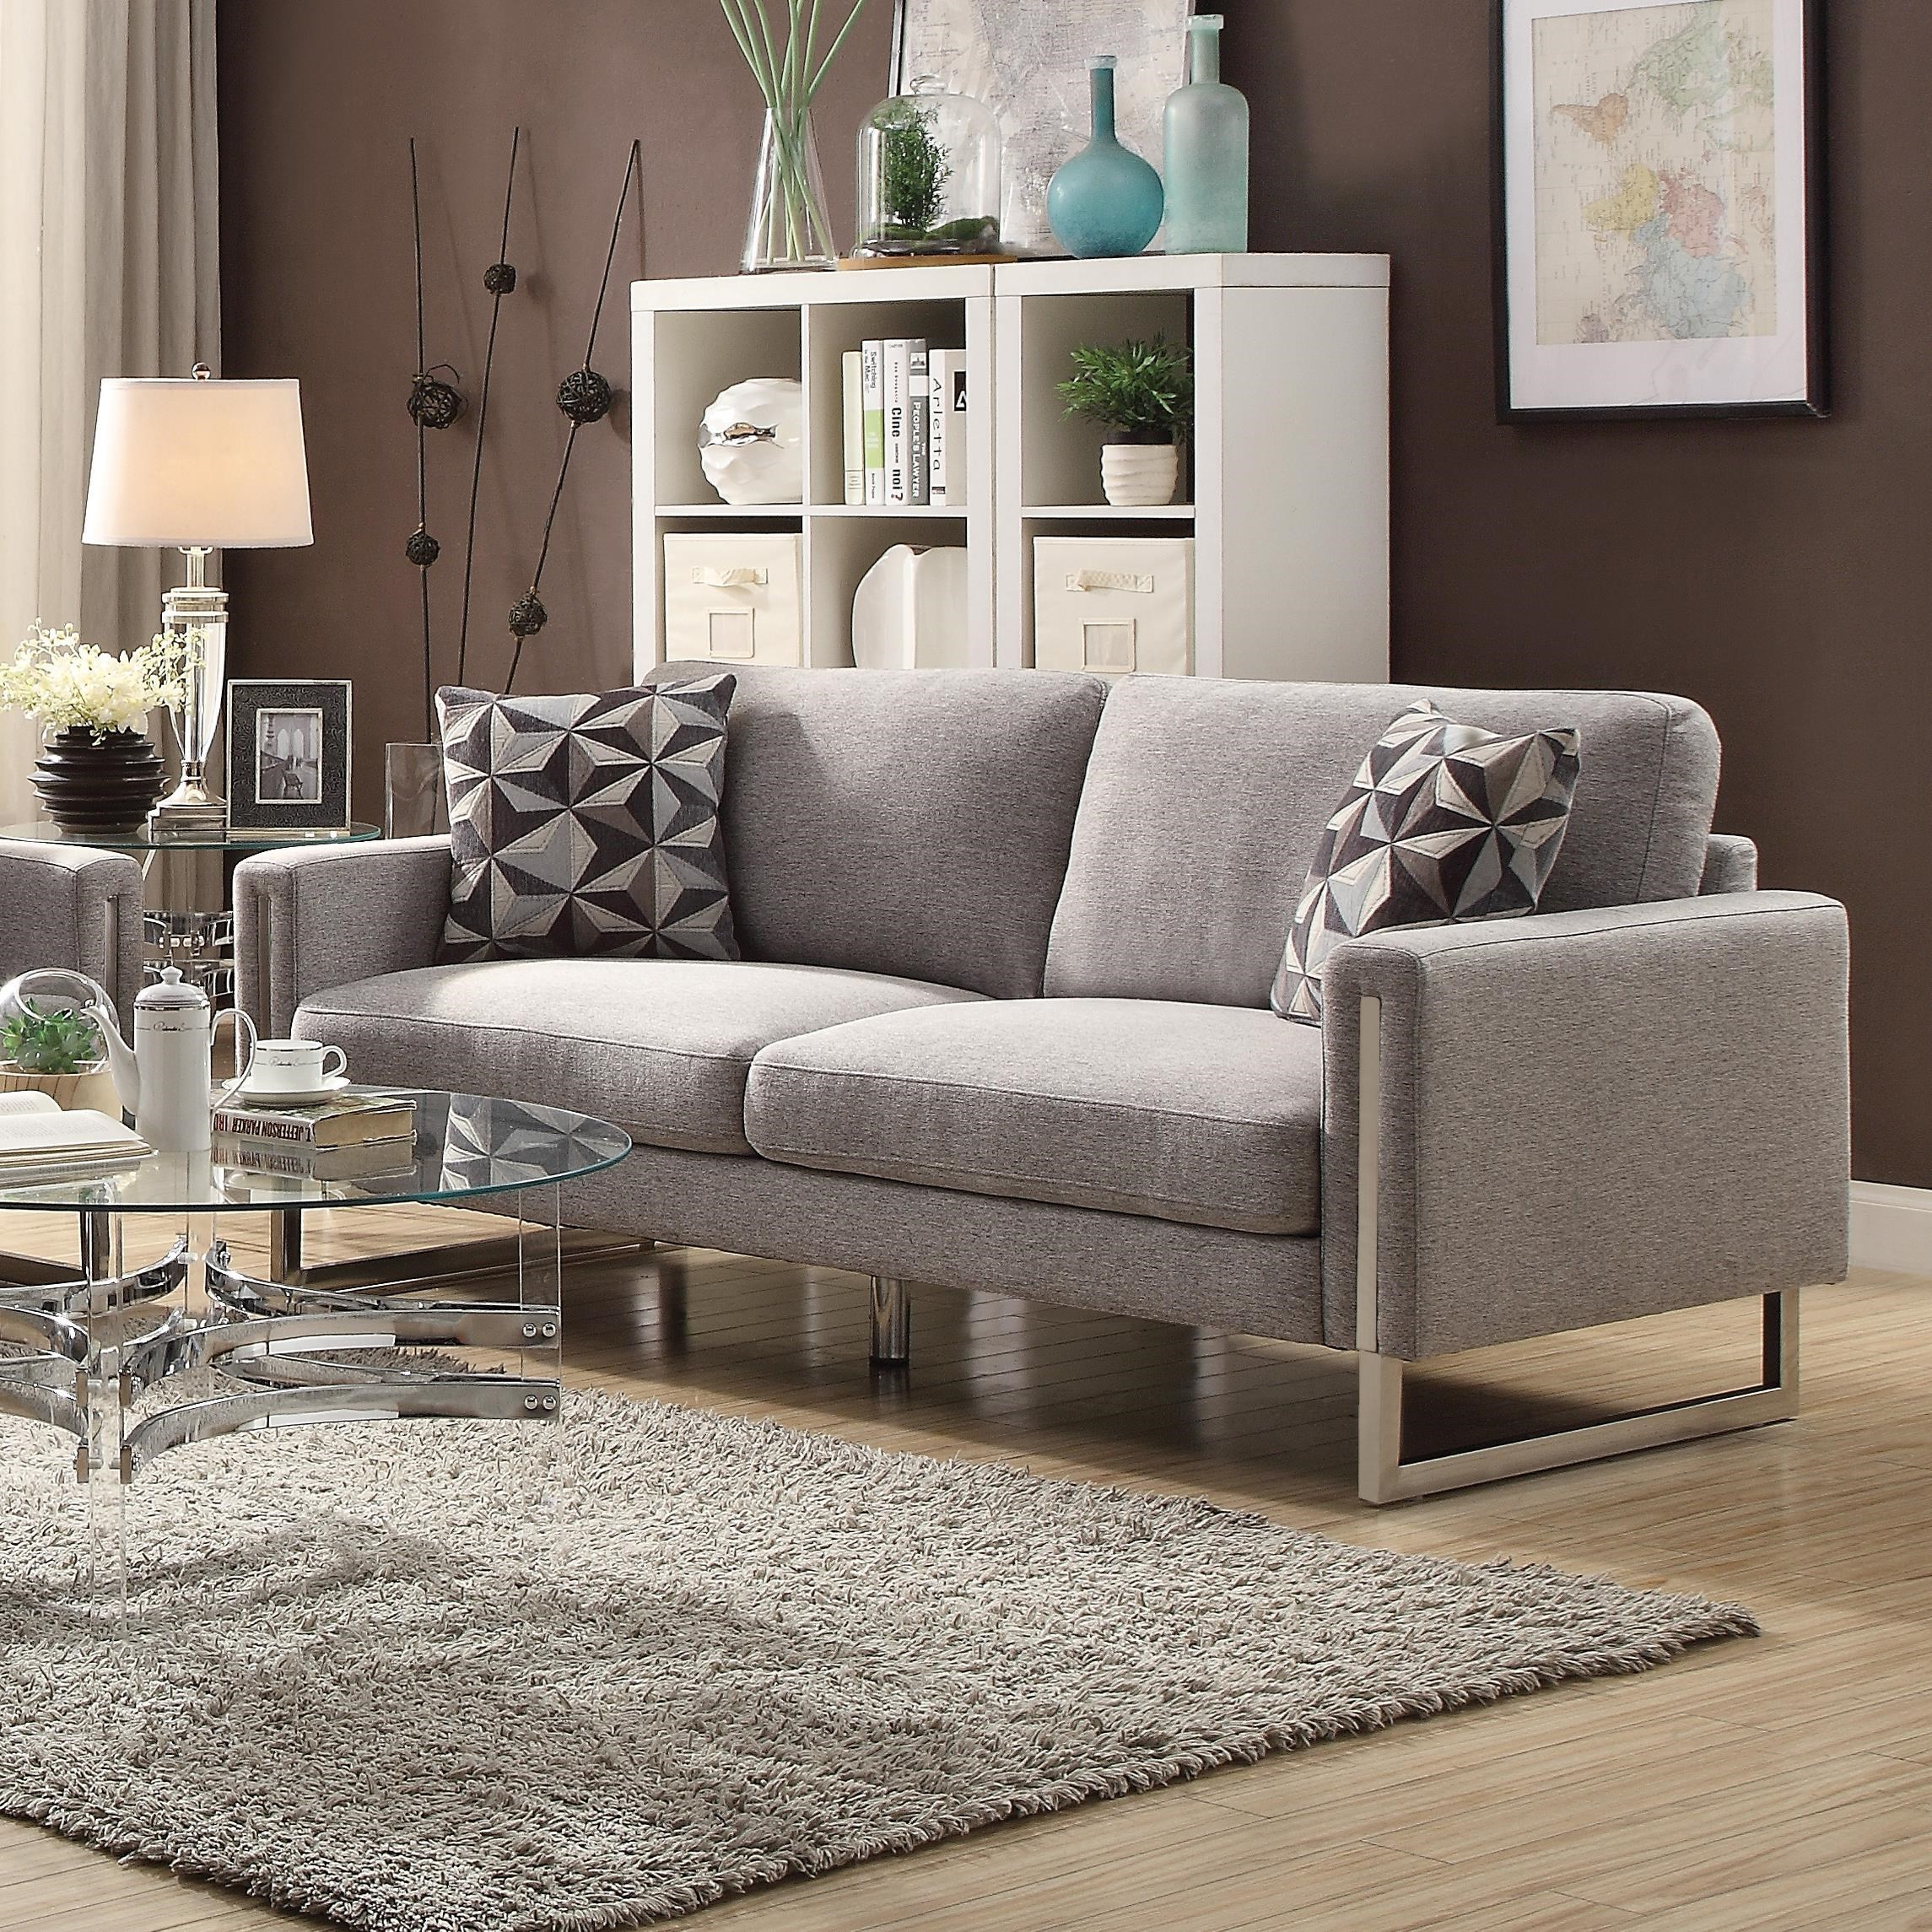 Ashley Furniture Philadelphia: Stellan Modern Sofa With U-Shaped Steel Legs